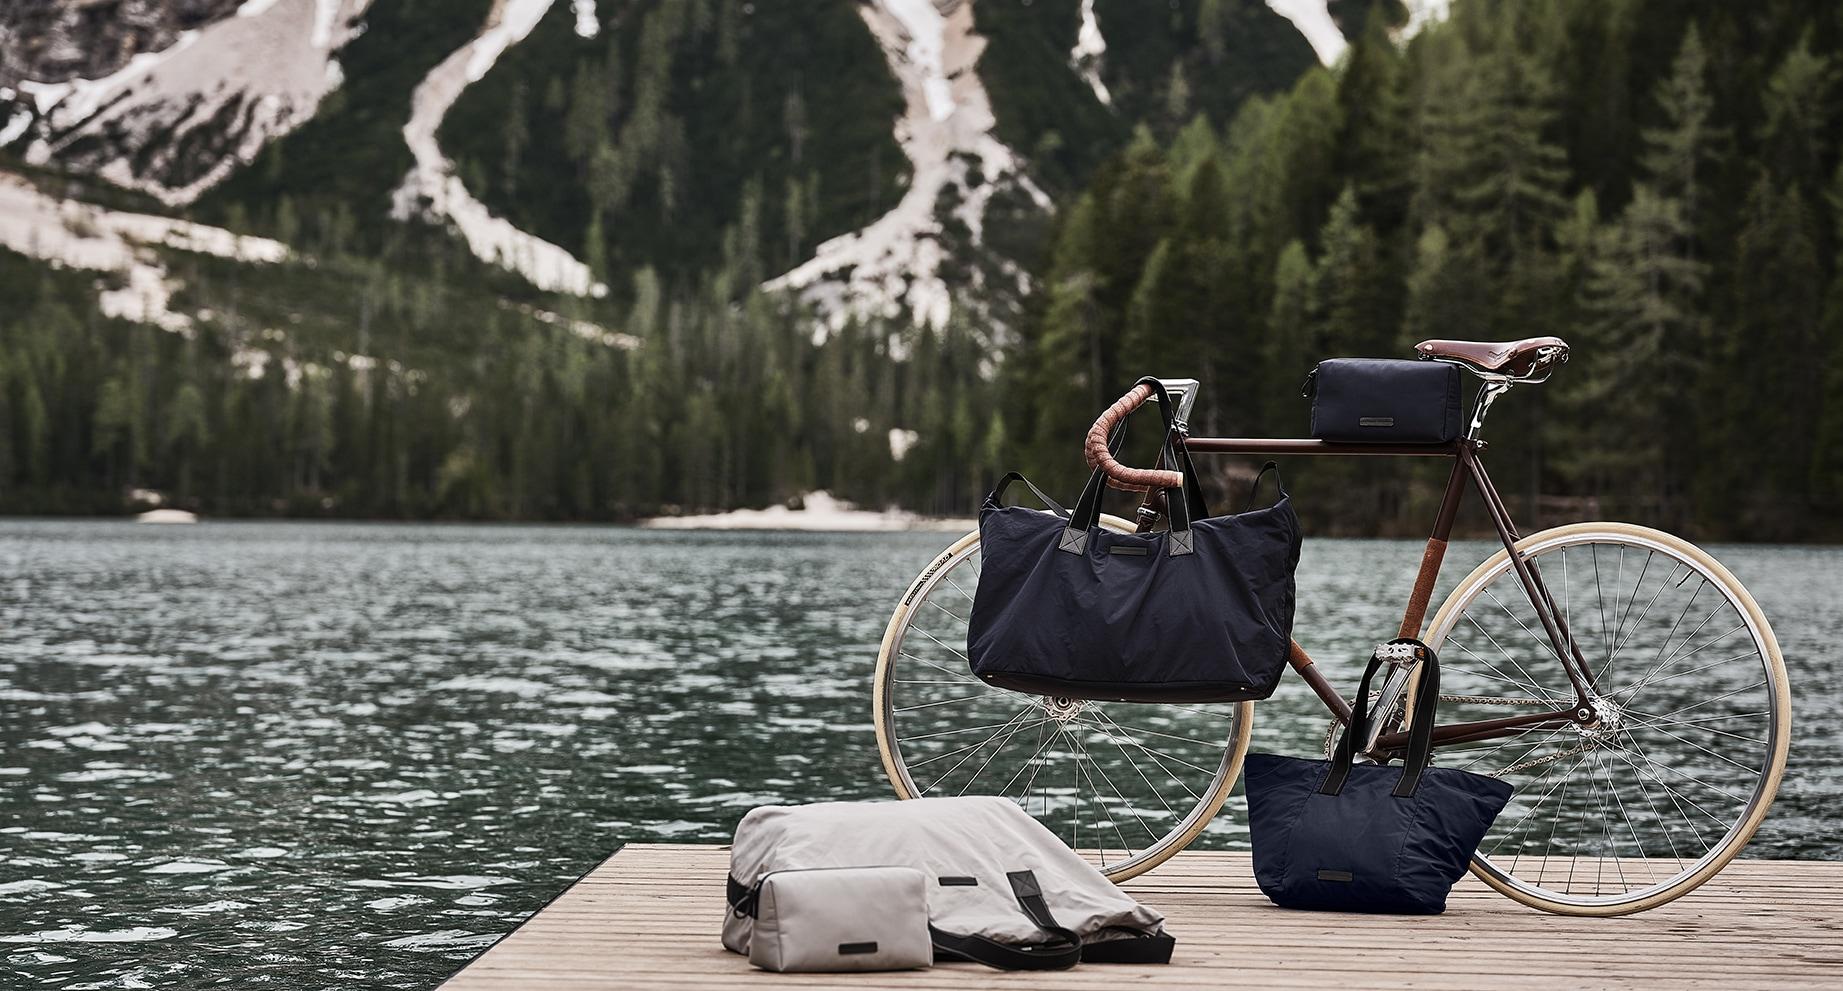 Lifestyle - Leisure&Travel